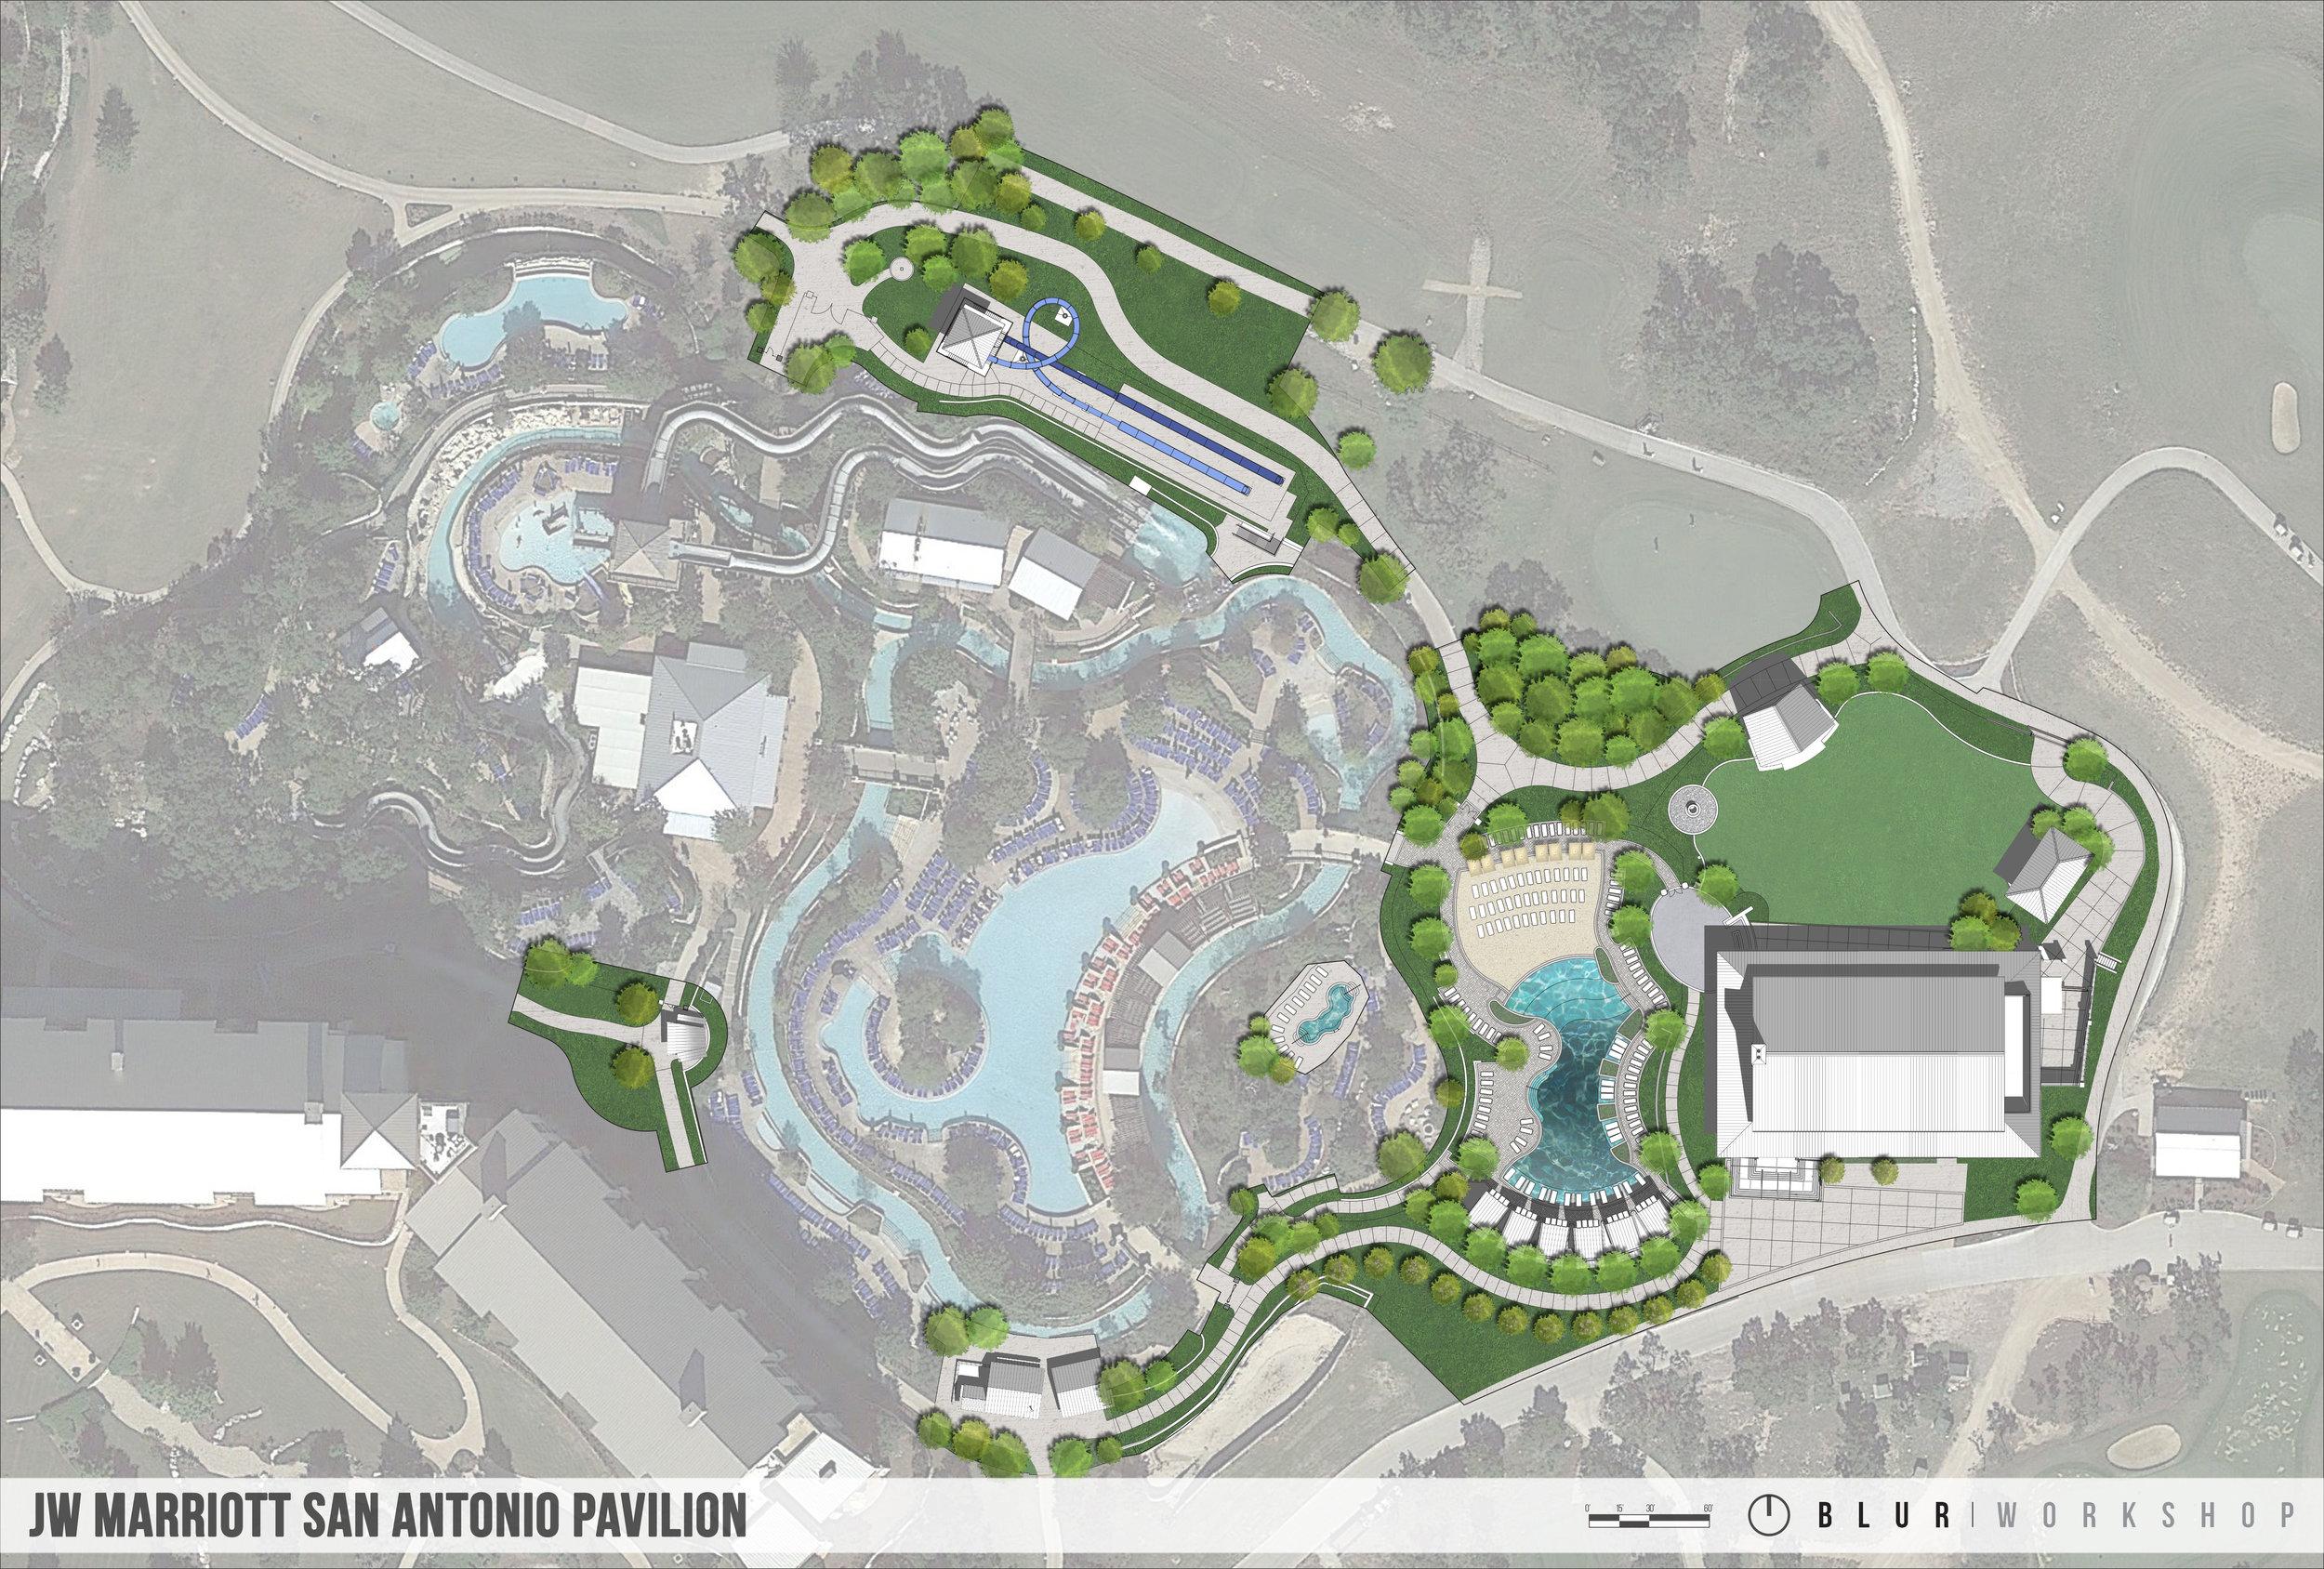 2017-0131_JW Marriott San Antonio_Illustrative Site Plan - FINAL.jpg